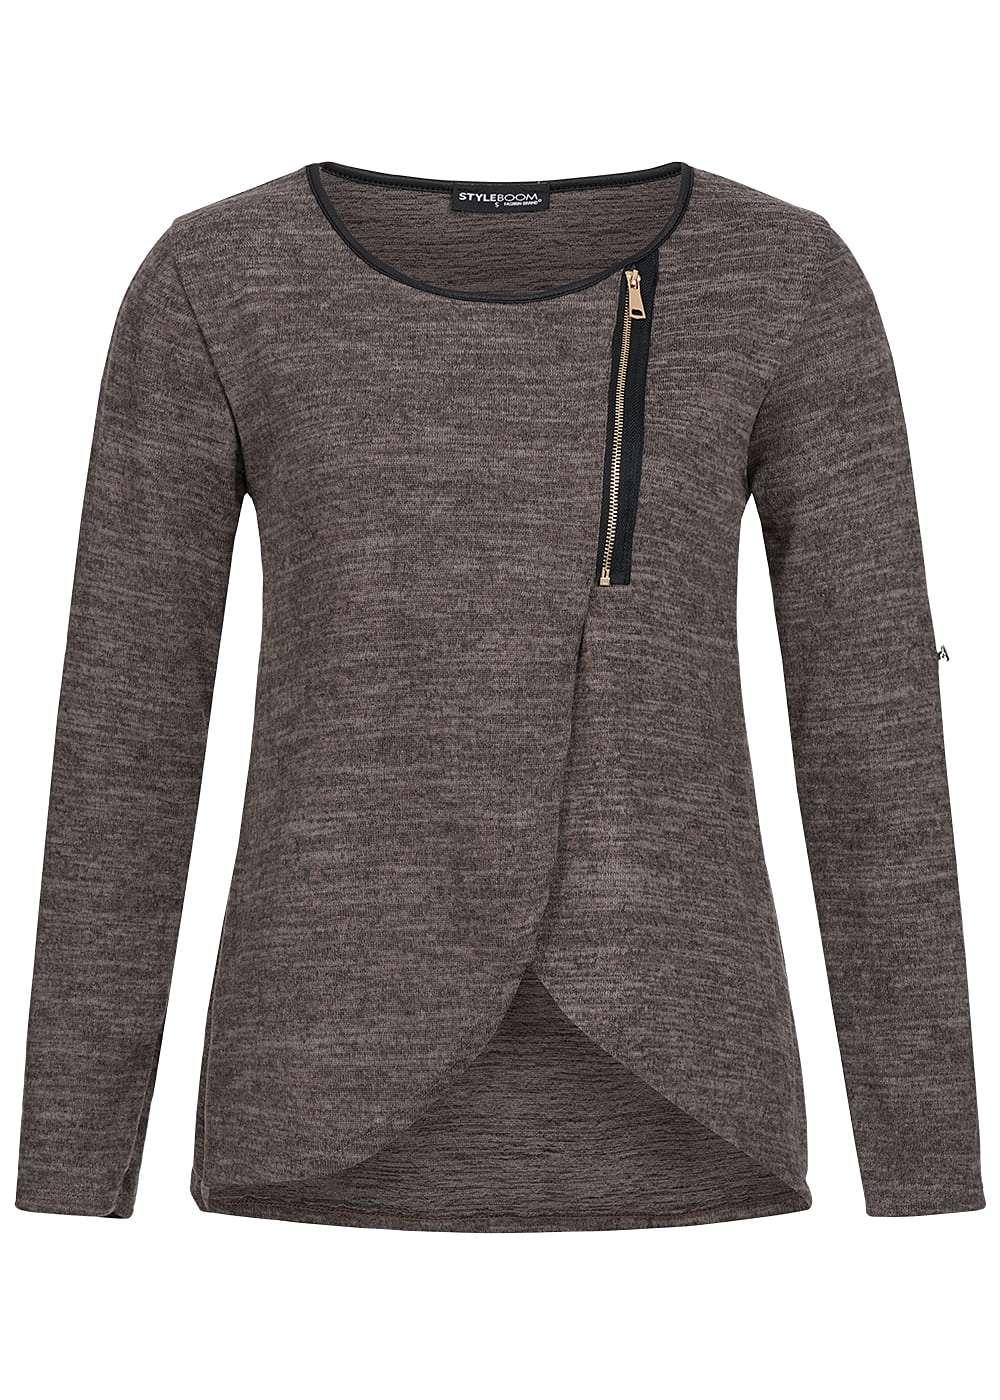 styleboom fashion damen turn up shirt asym zipper hinten l nger fango braun 77onlineshop. Black Bedroom Furniture Sets. Home Design Ideas